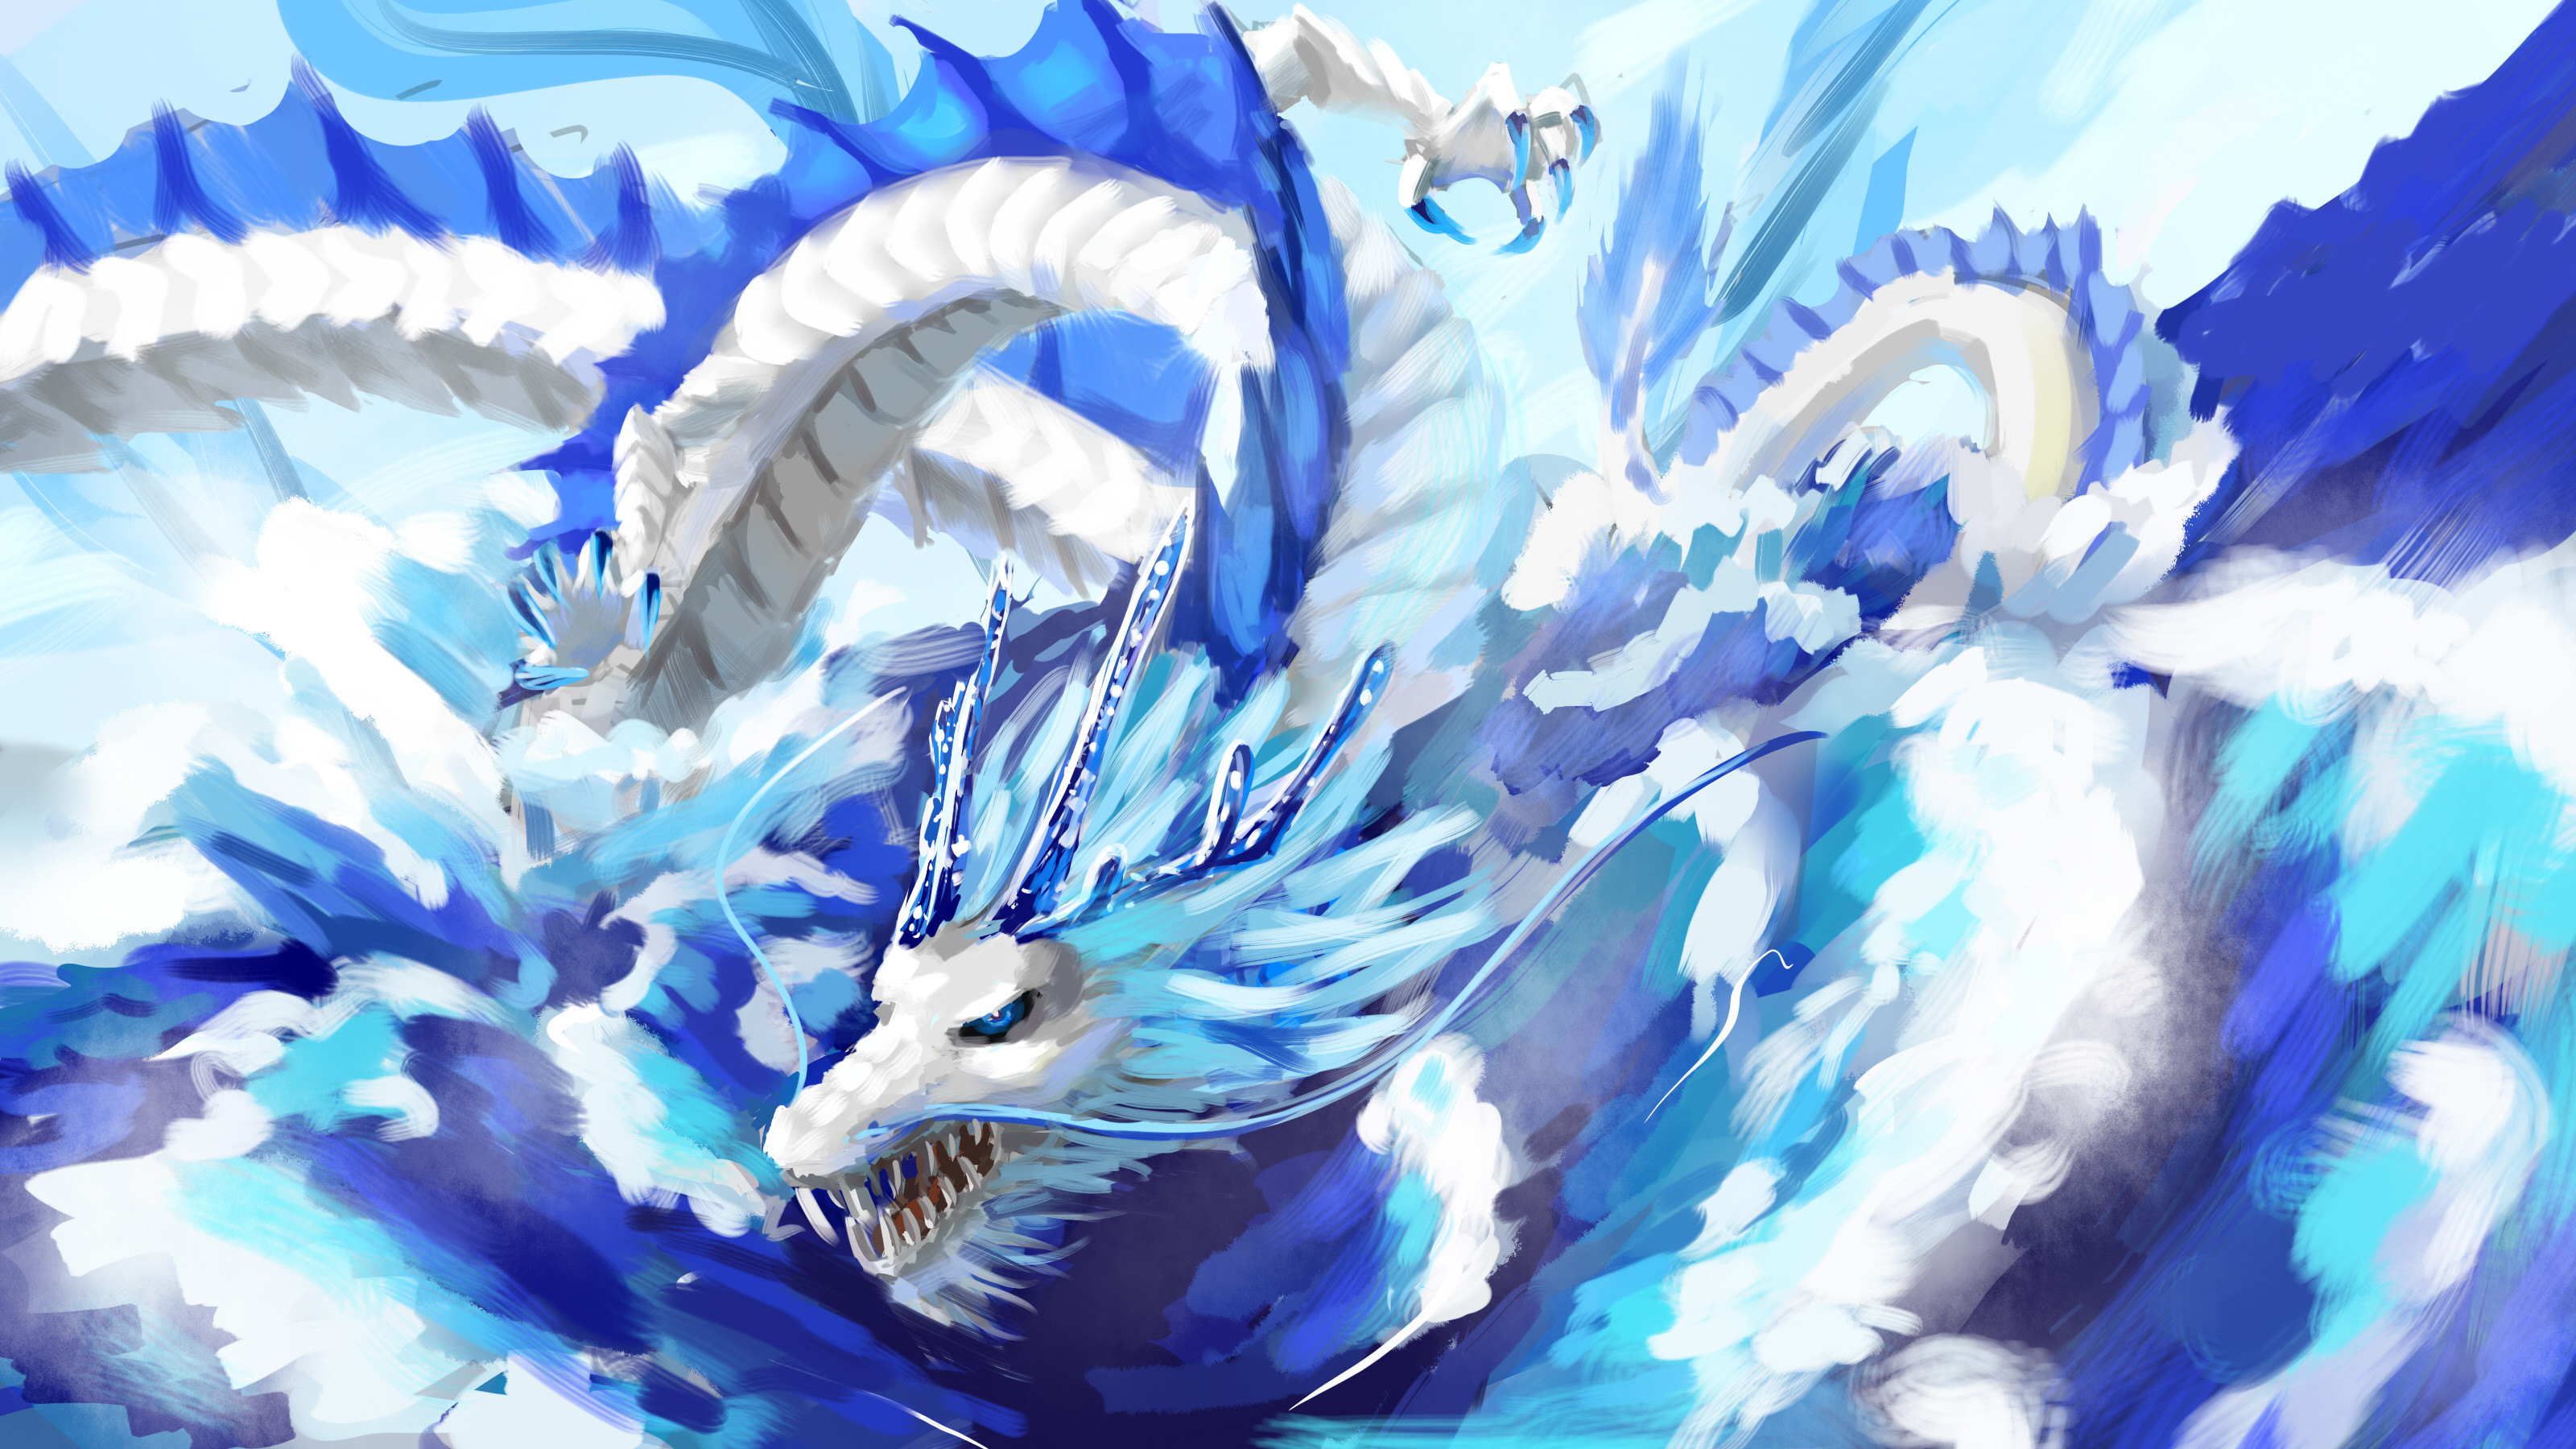 Blue Eyes White Dragon Wallpaper Images | TheCelebrityPix